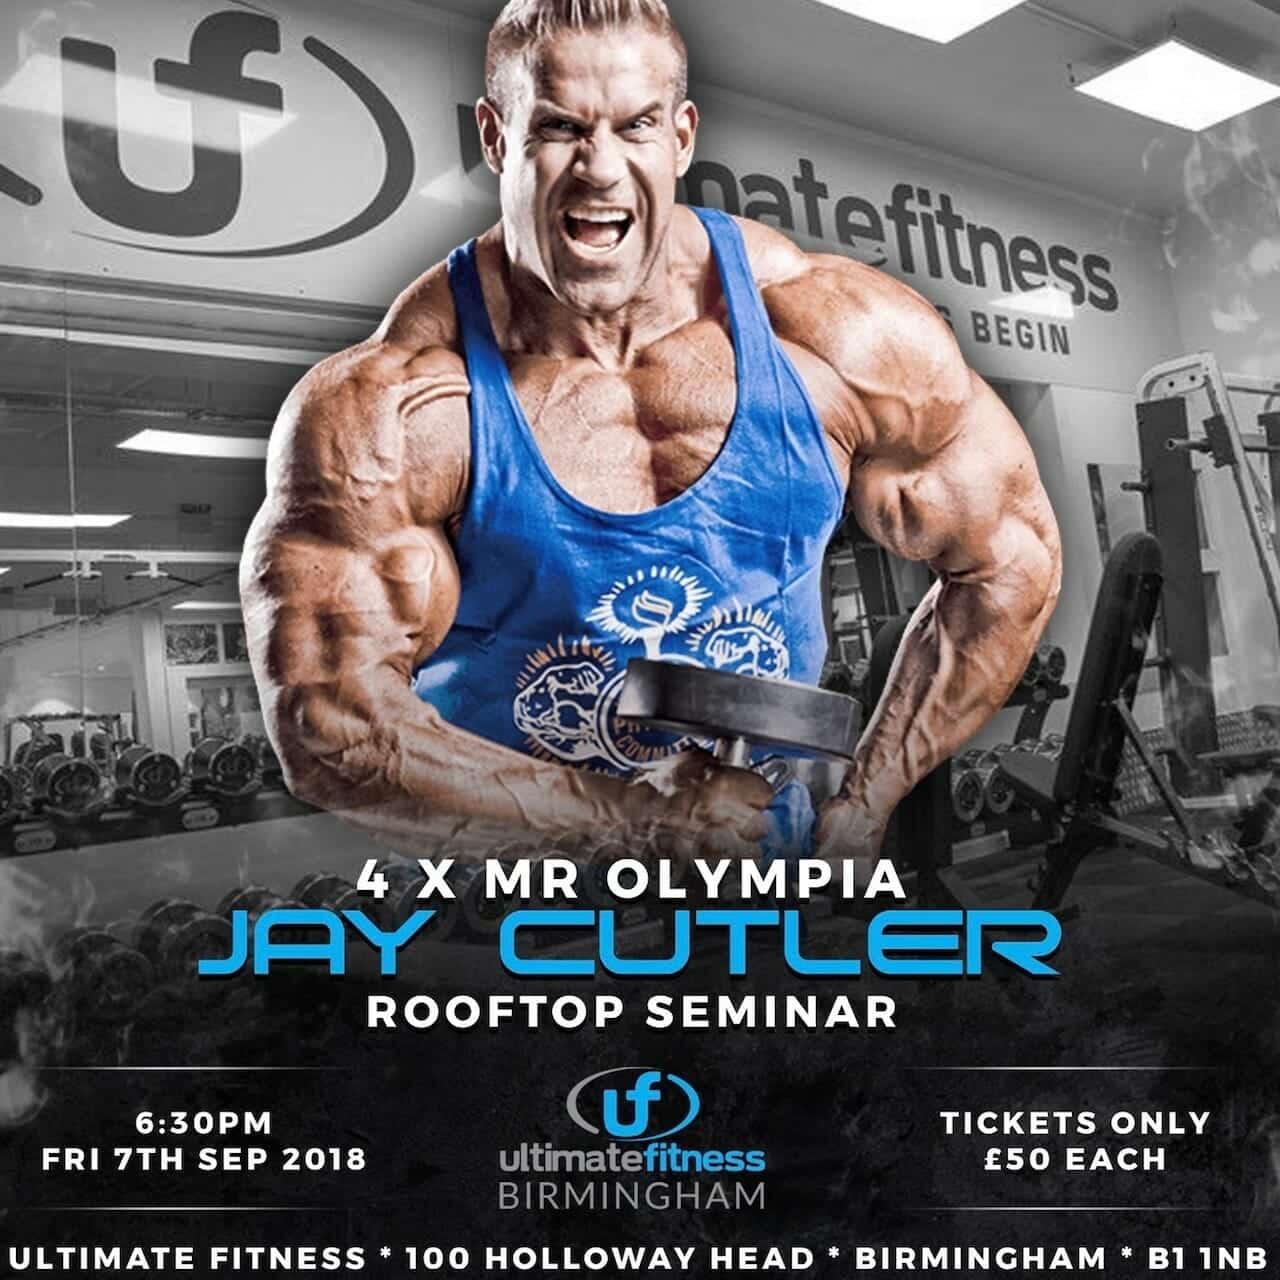 Jay Cutler at Birmingham Ultimate Fitness